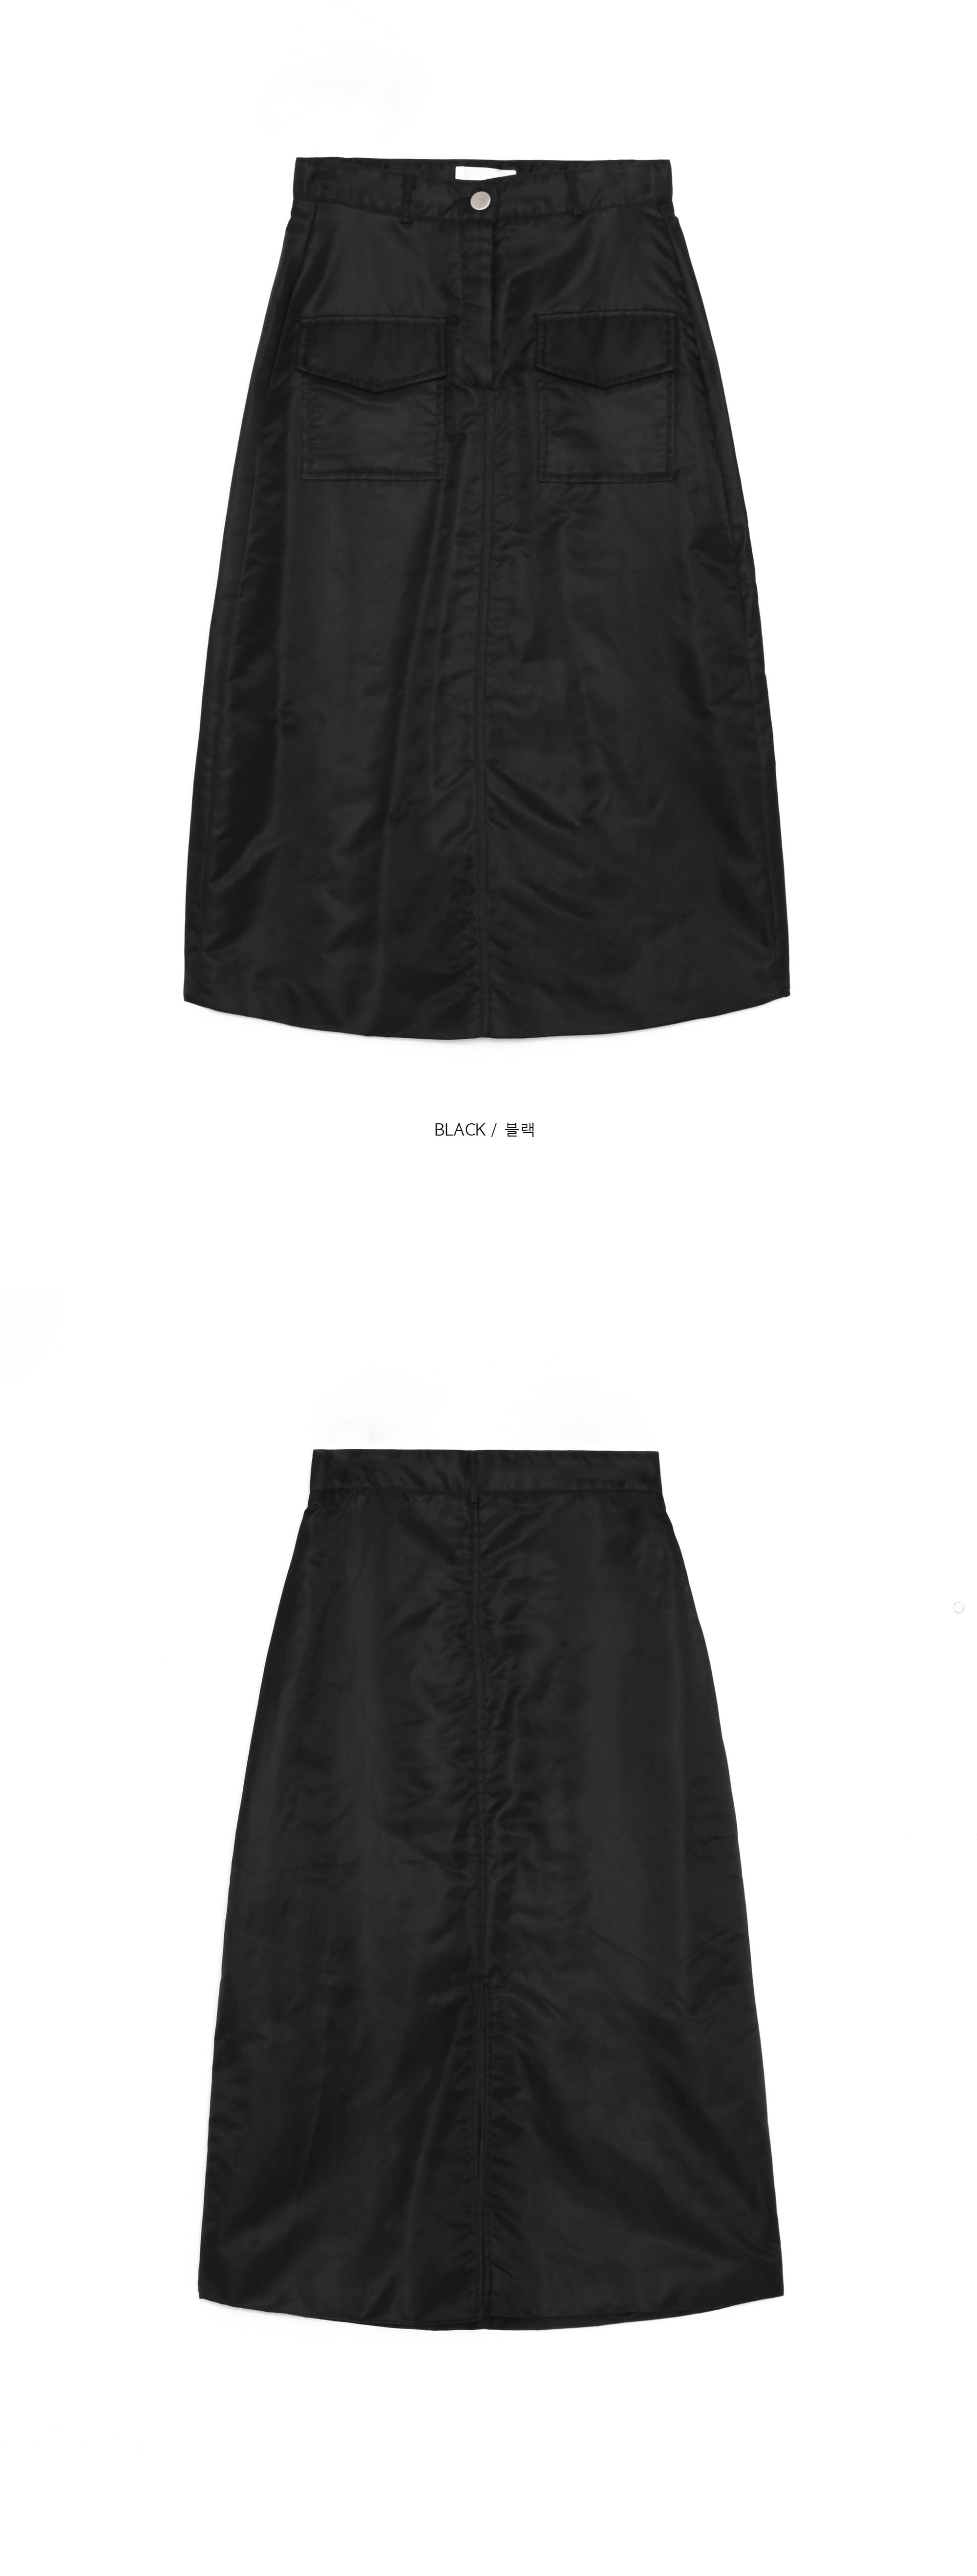 padding cargo skirt - woman